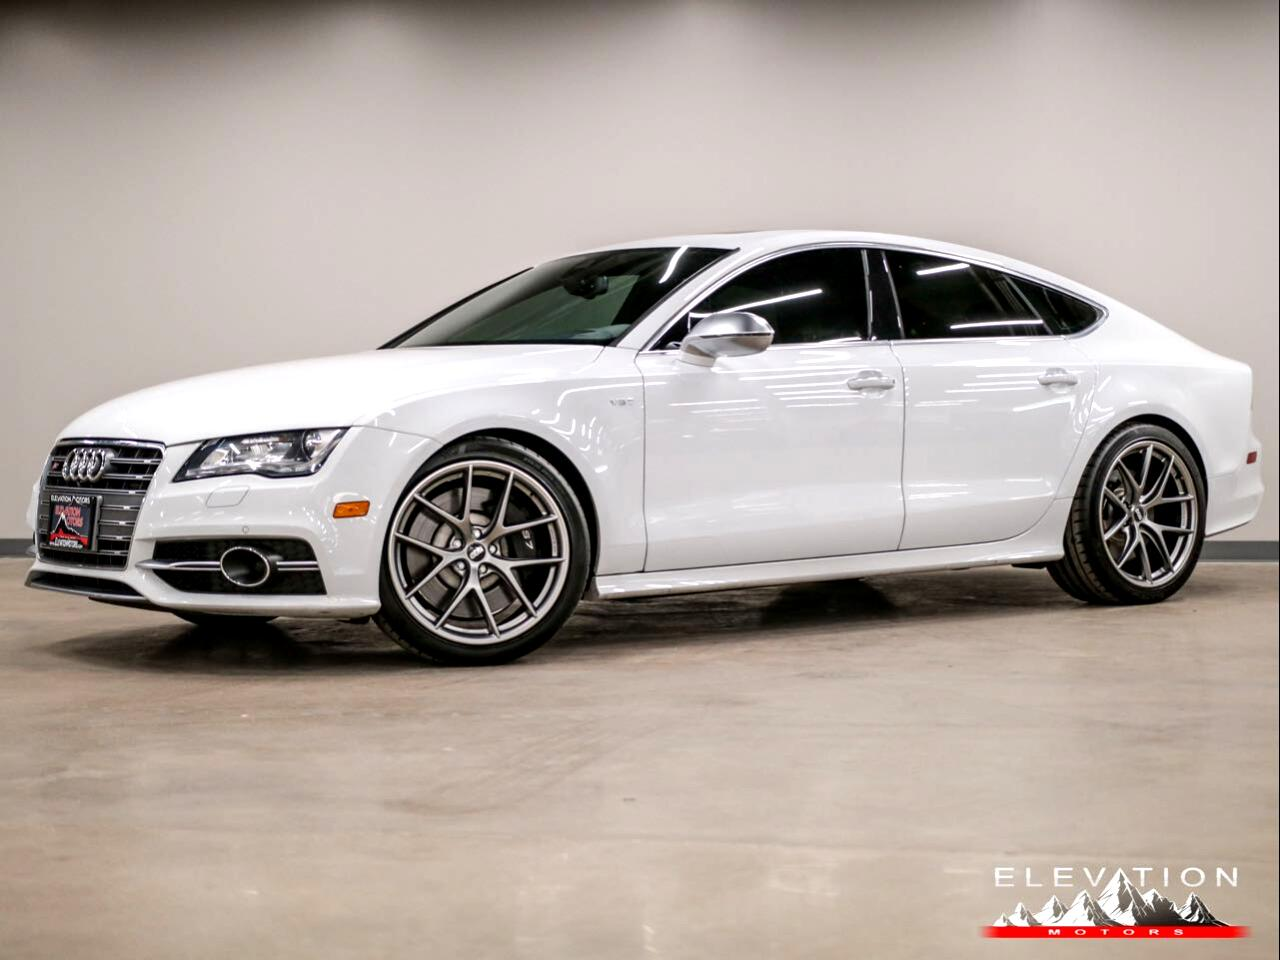 2013 Audi S7 4.0 Prestige quattro S tronic